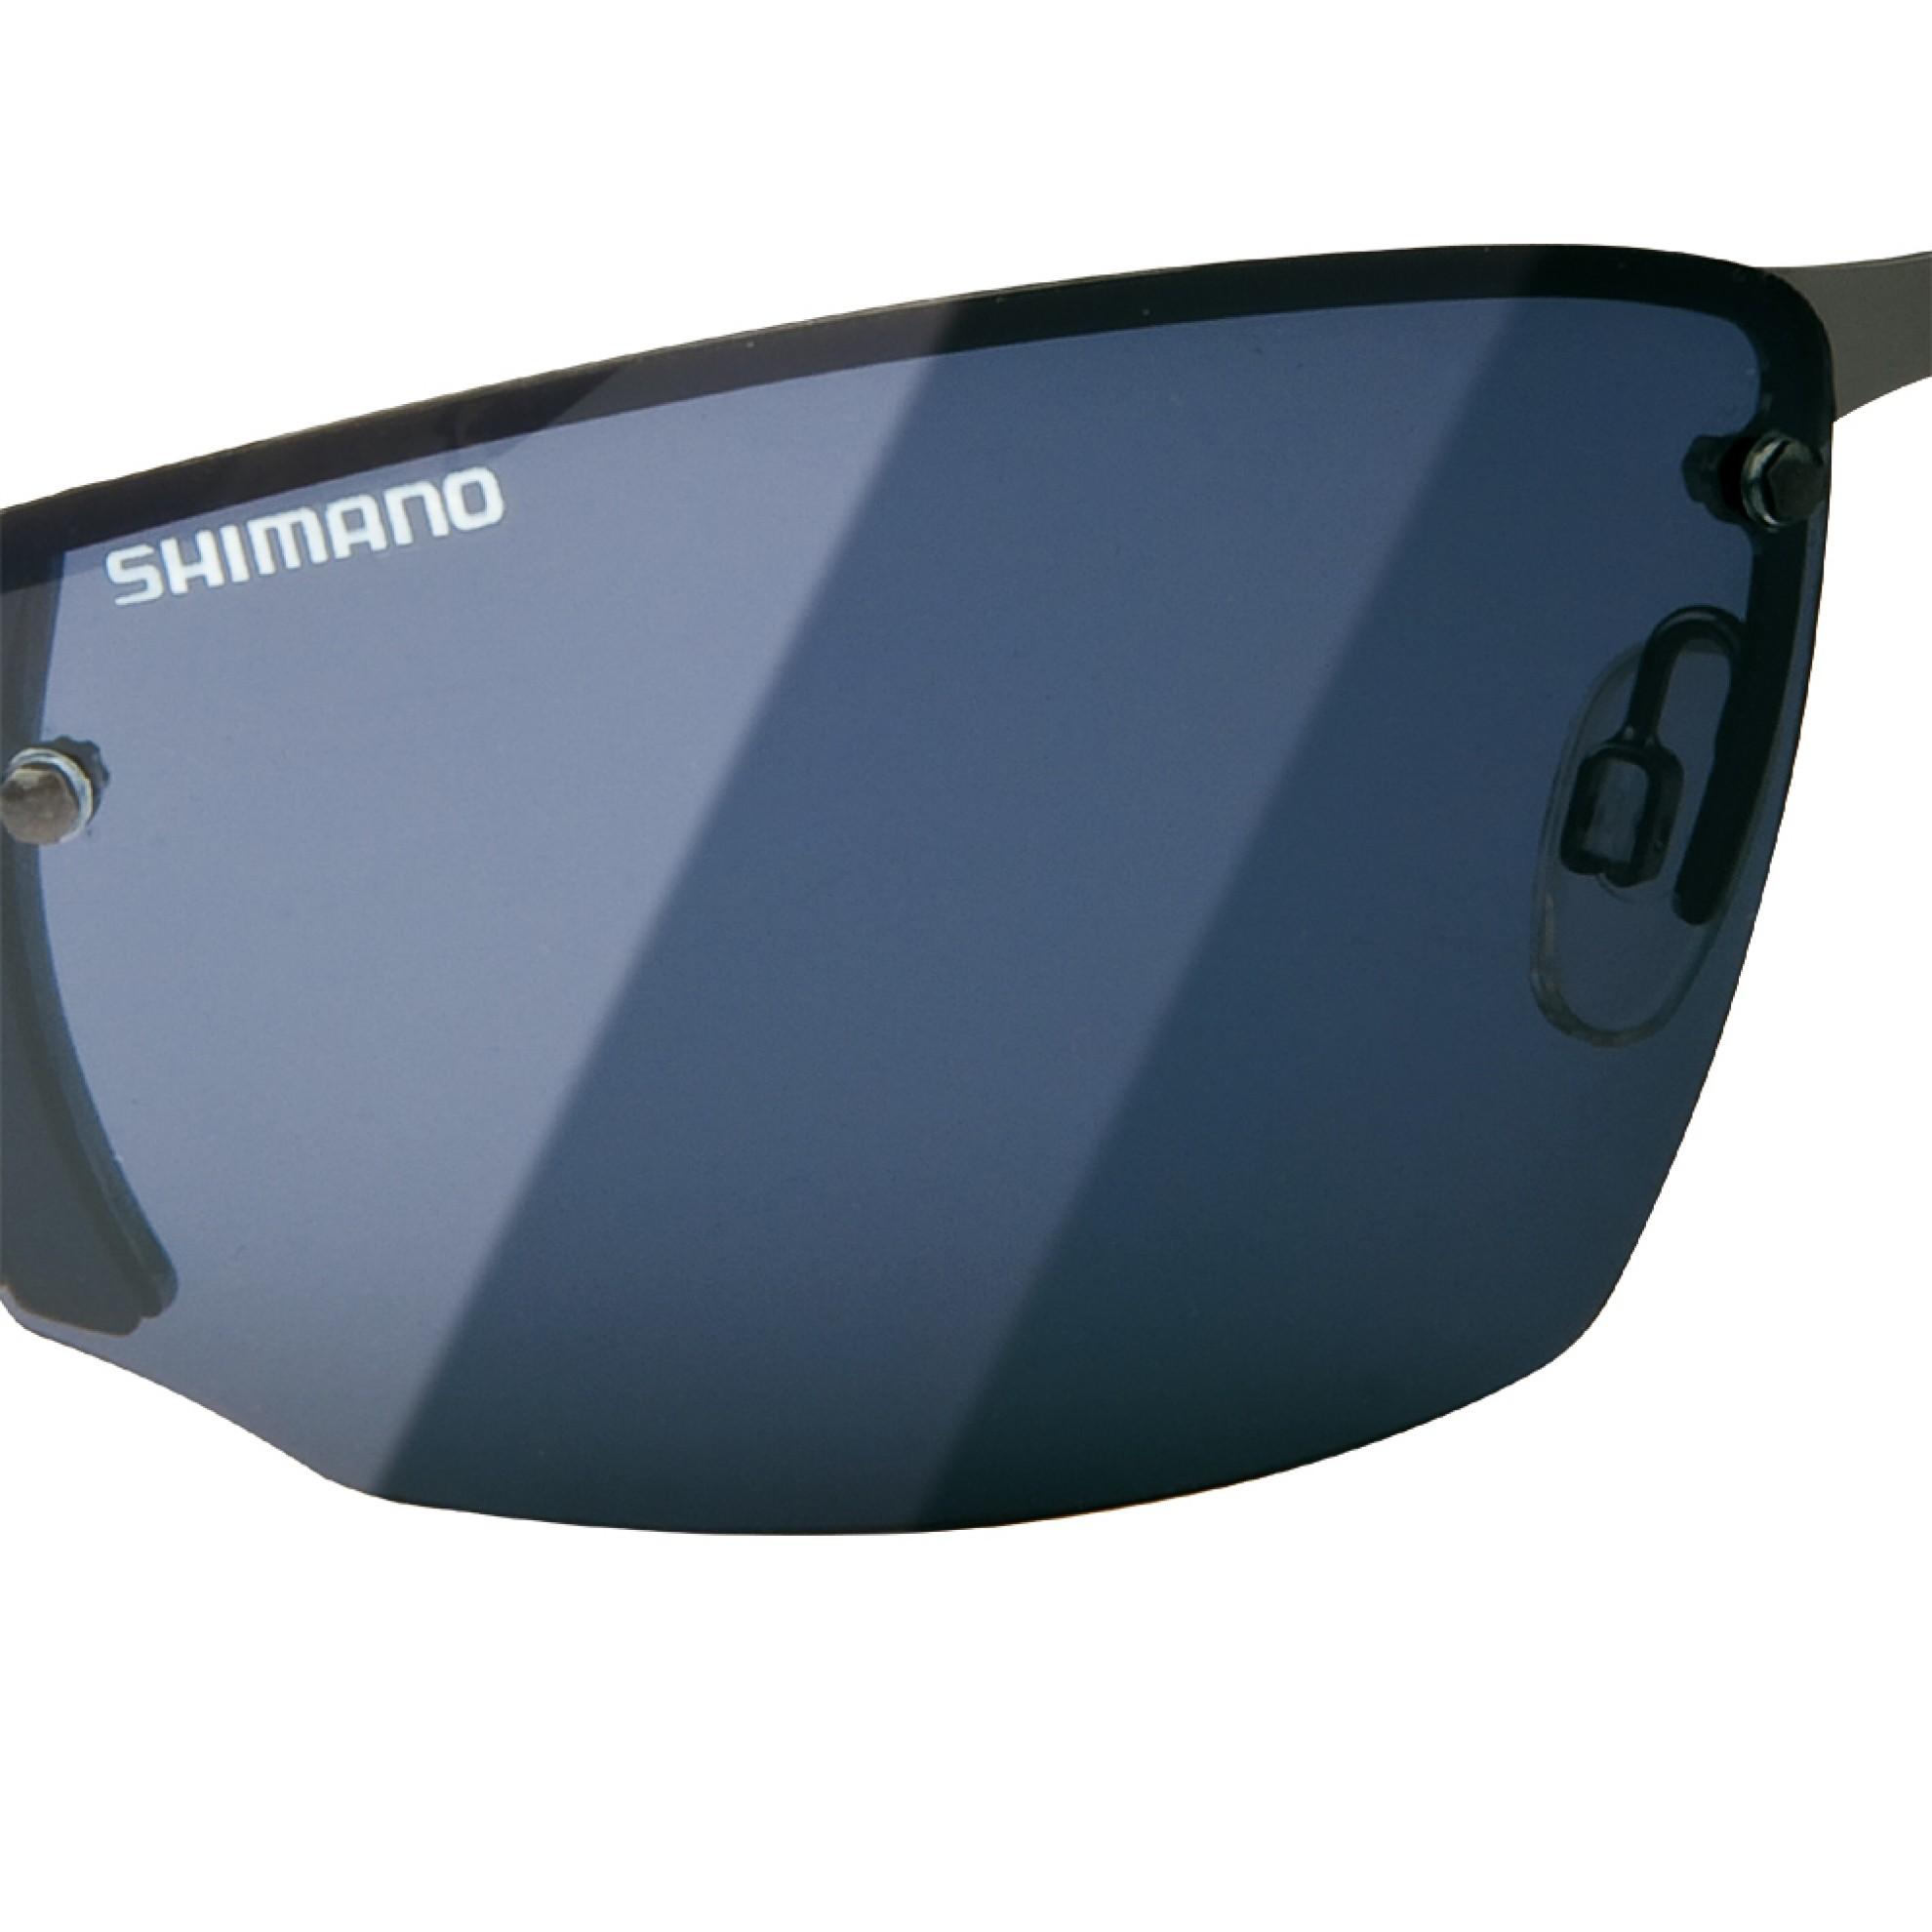 c153e2d3f58 SHIMANO Aspire polarized Sunglass SHIMANO Aspire polarized Sunglass SHIMANO  Aspire polarized Sunglass